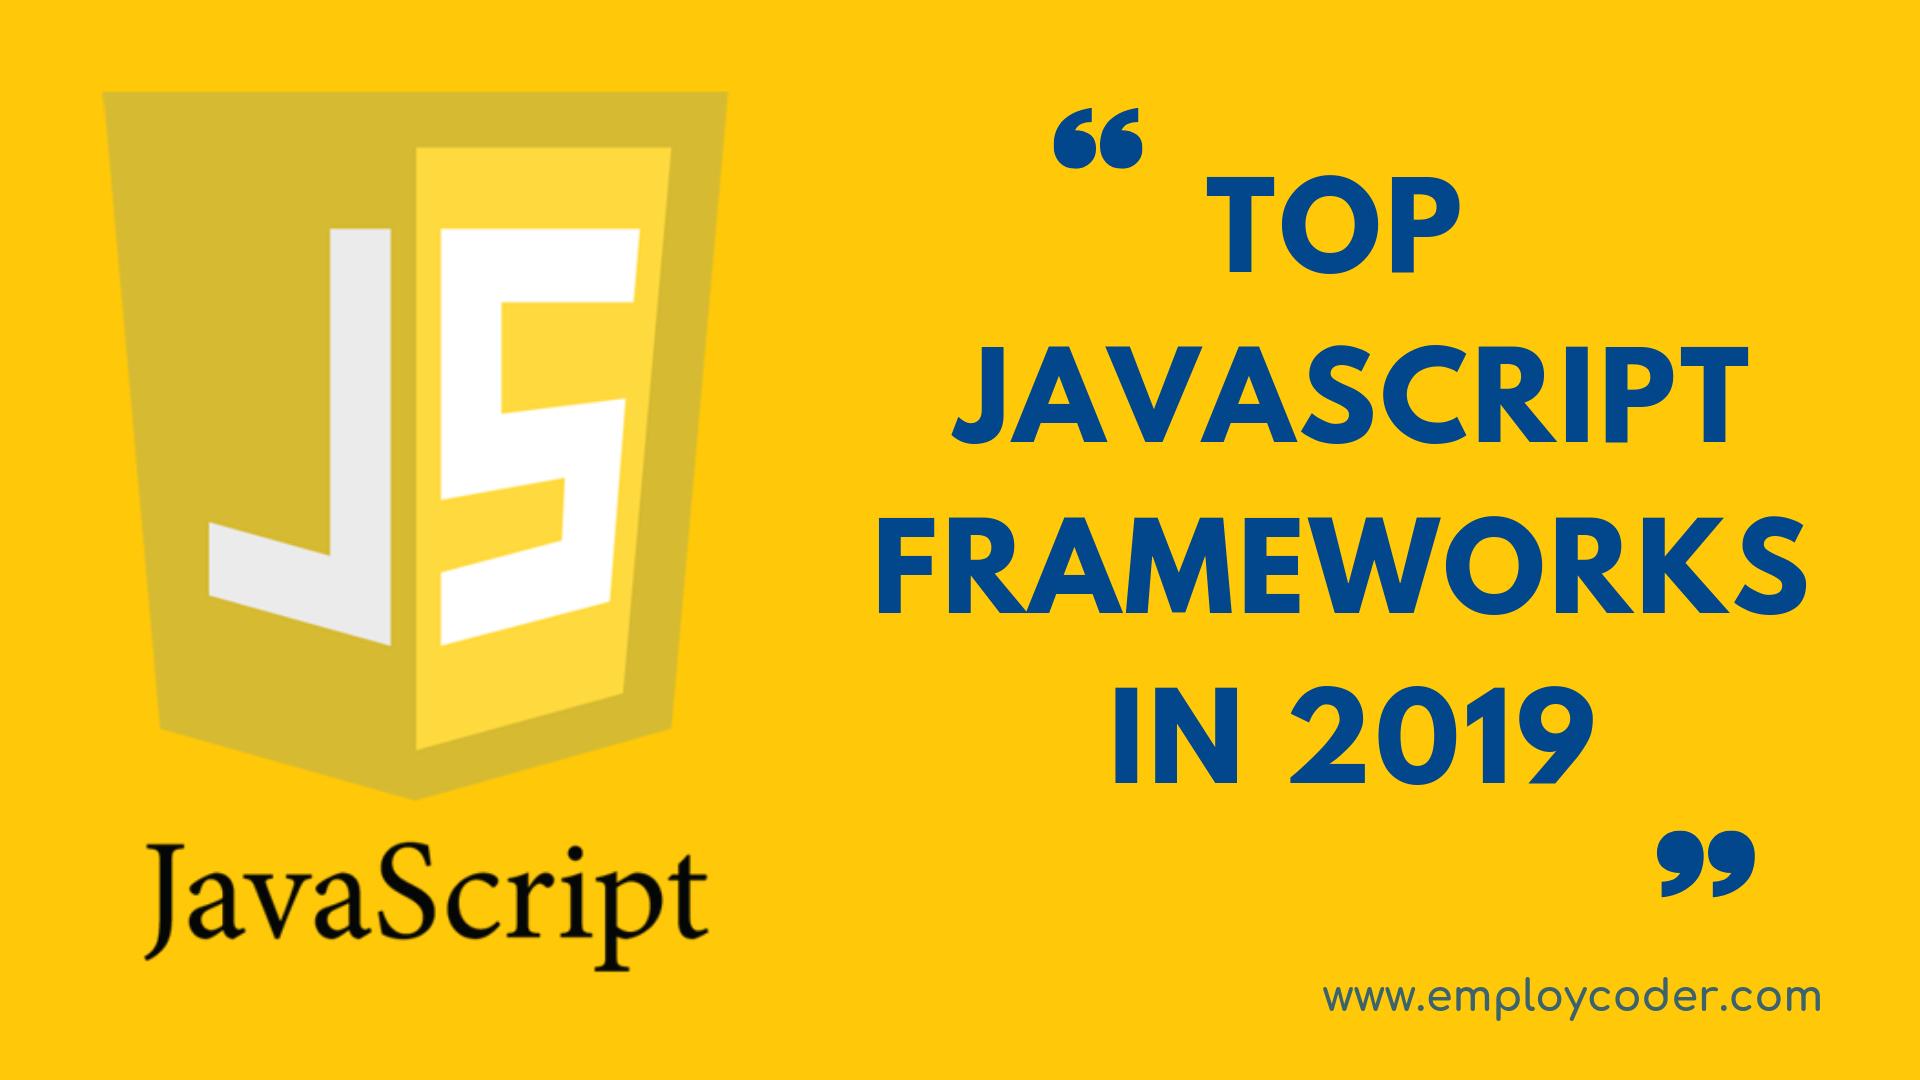 Top JavaScript Frameworks in 2019